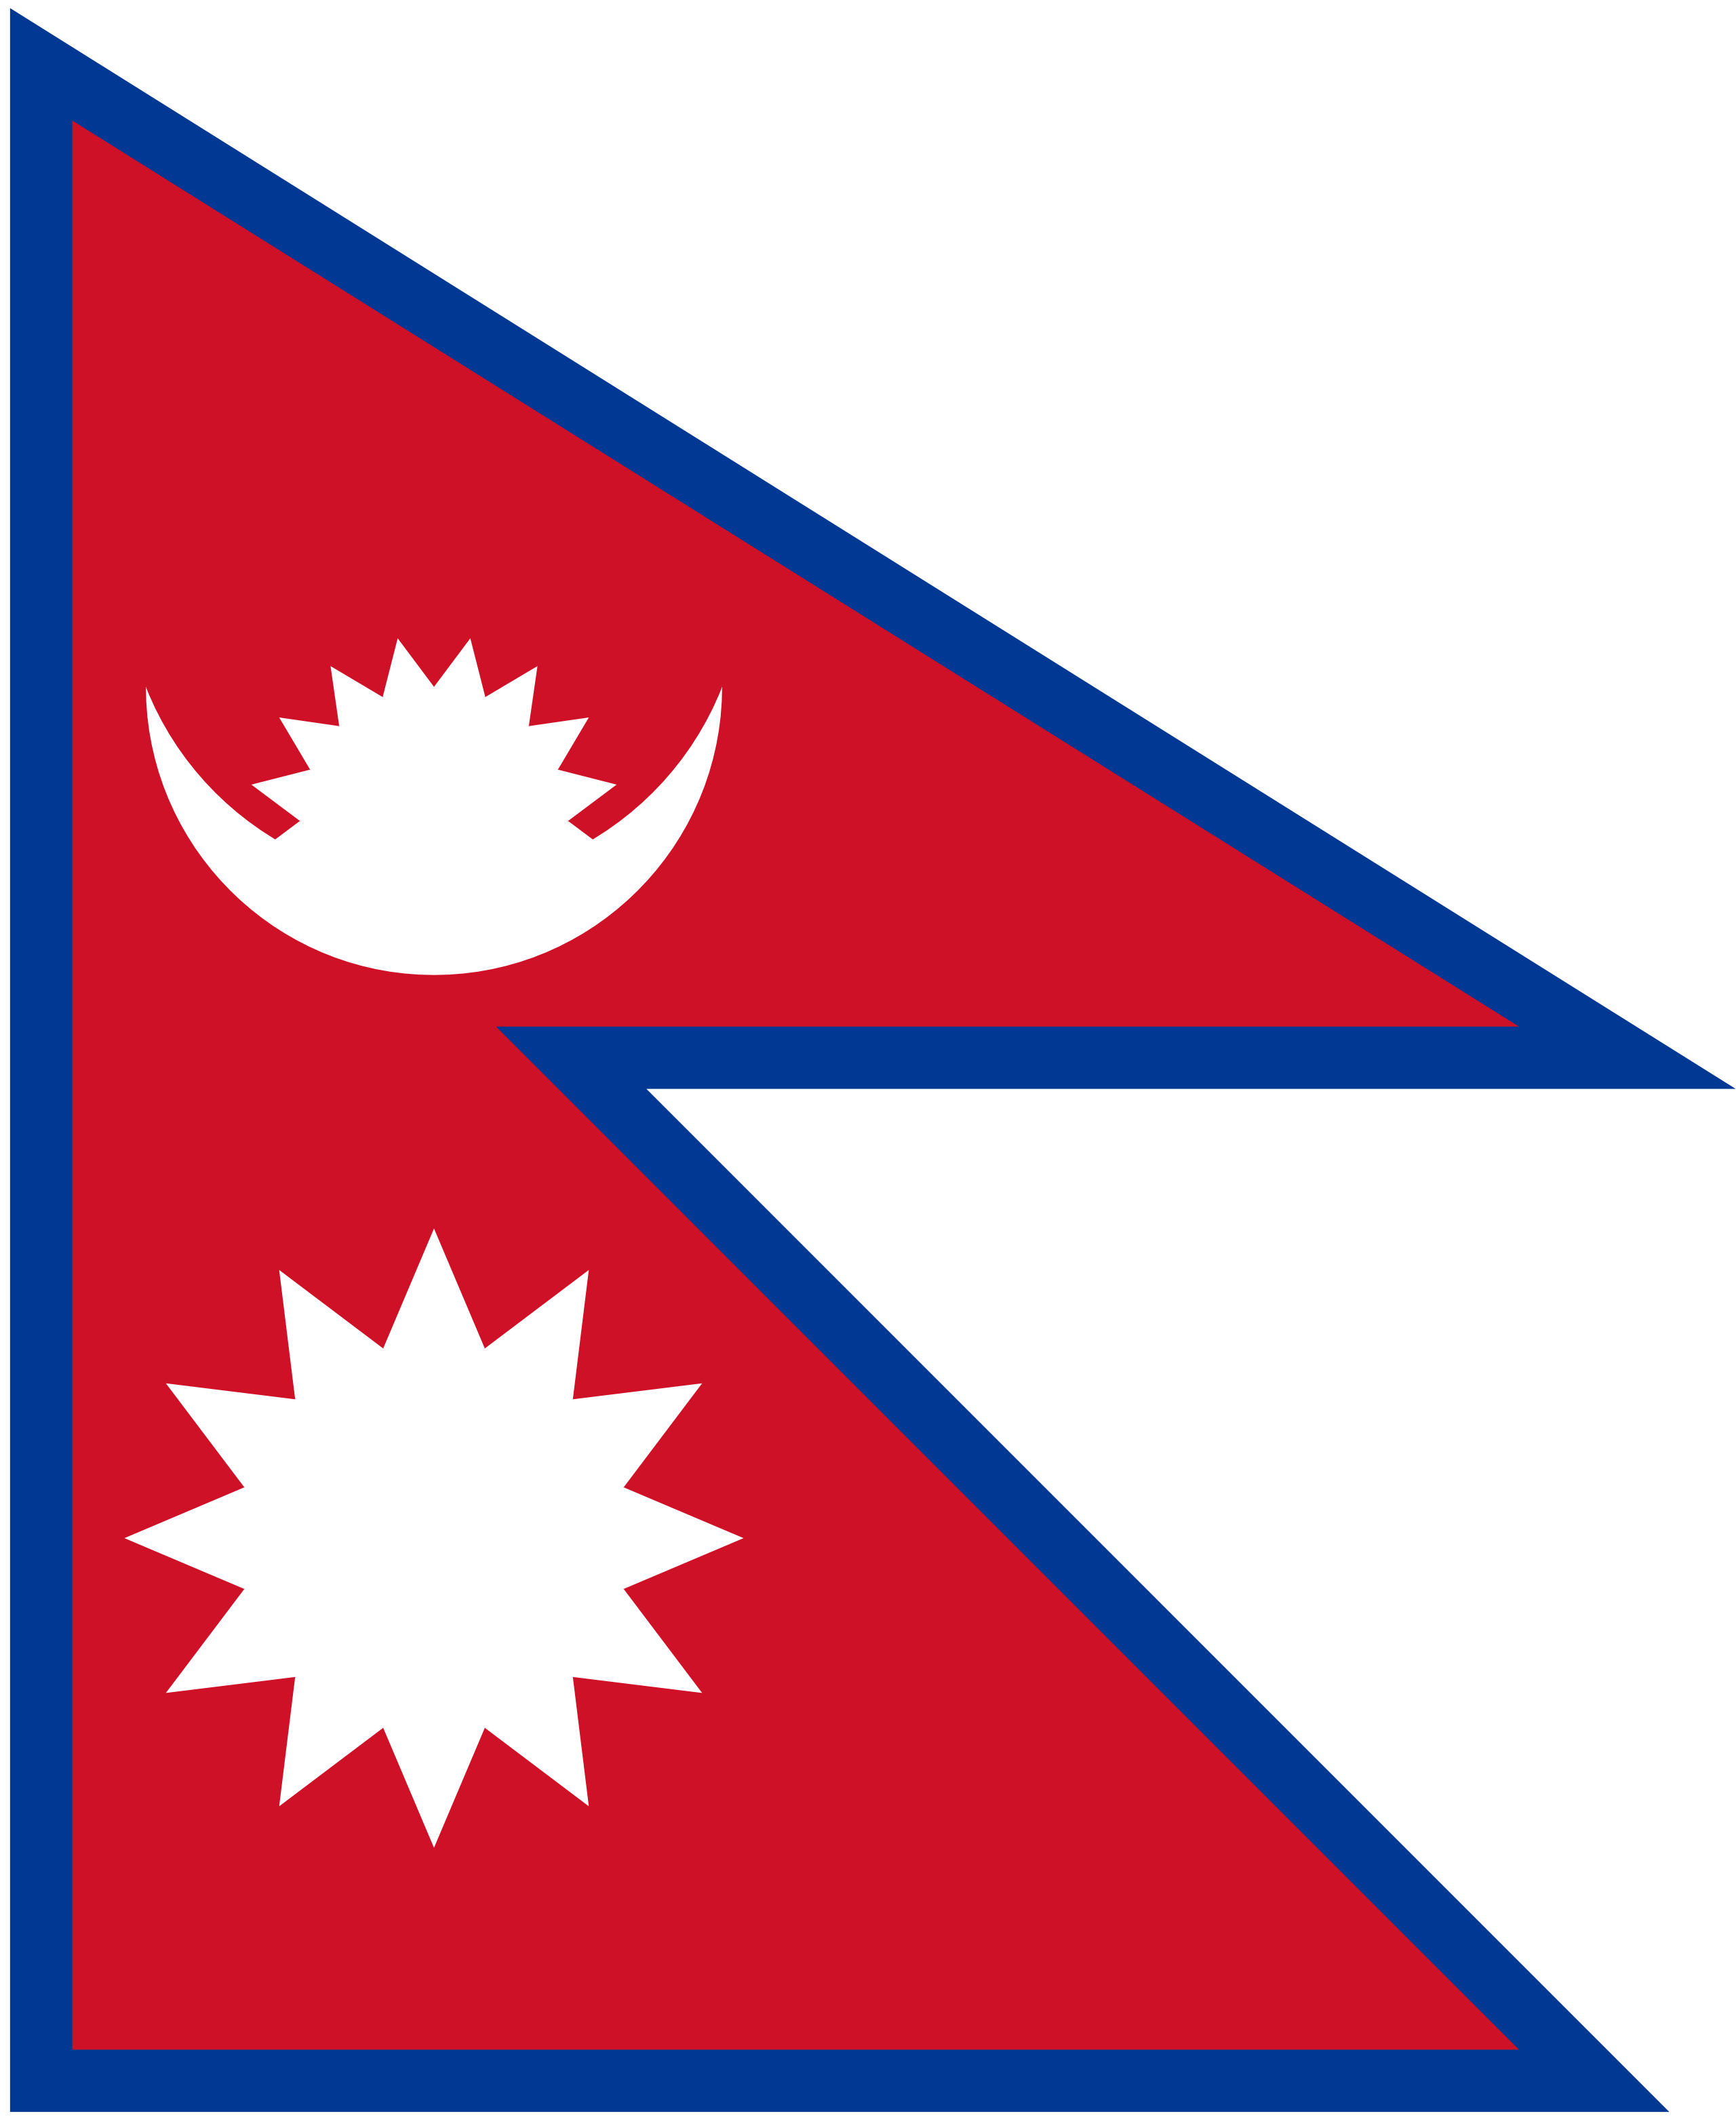 nepal, 国家, 会徽, 徽标, 符号 - 高清壁纸 - 教授-falken.com